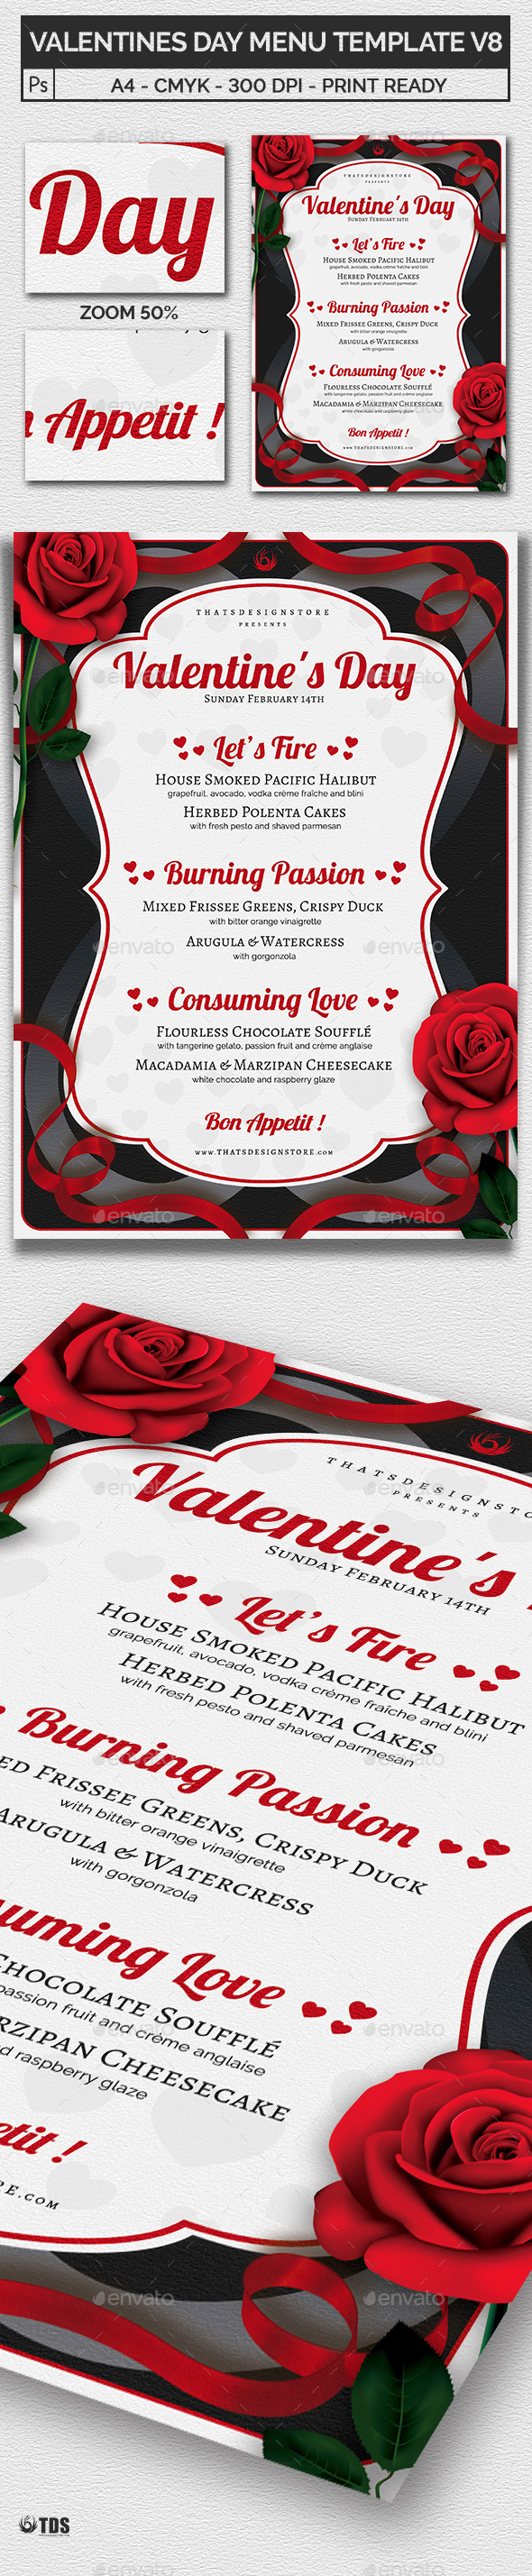 Valentines Day Menu Template V8 - Restaurant Flyers